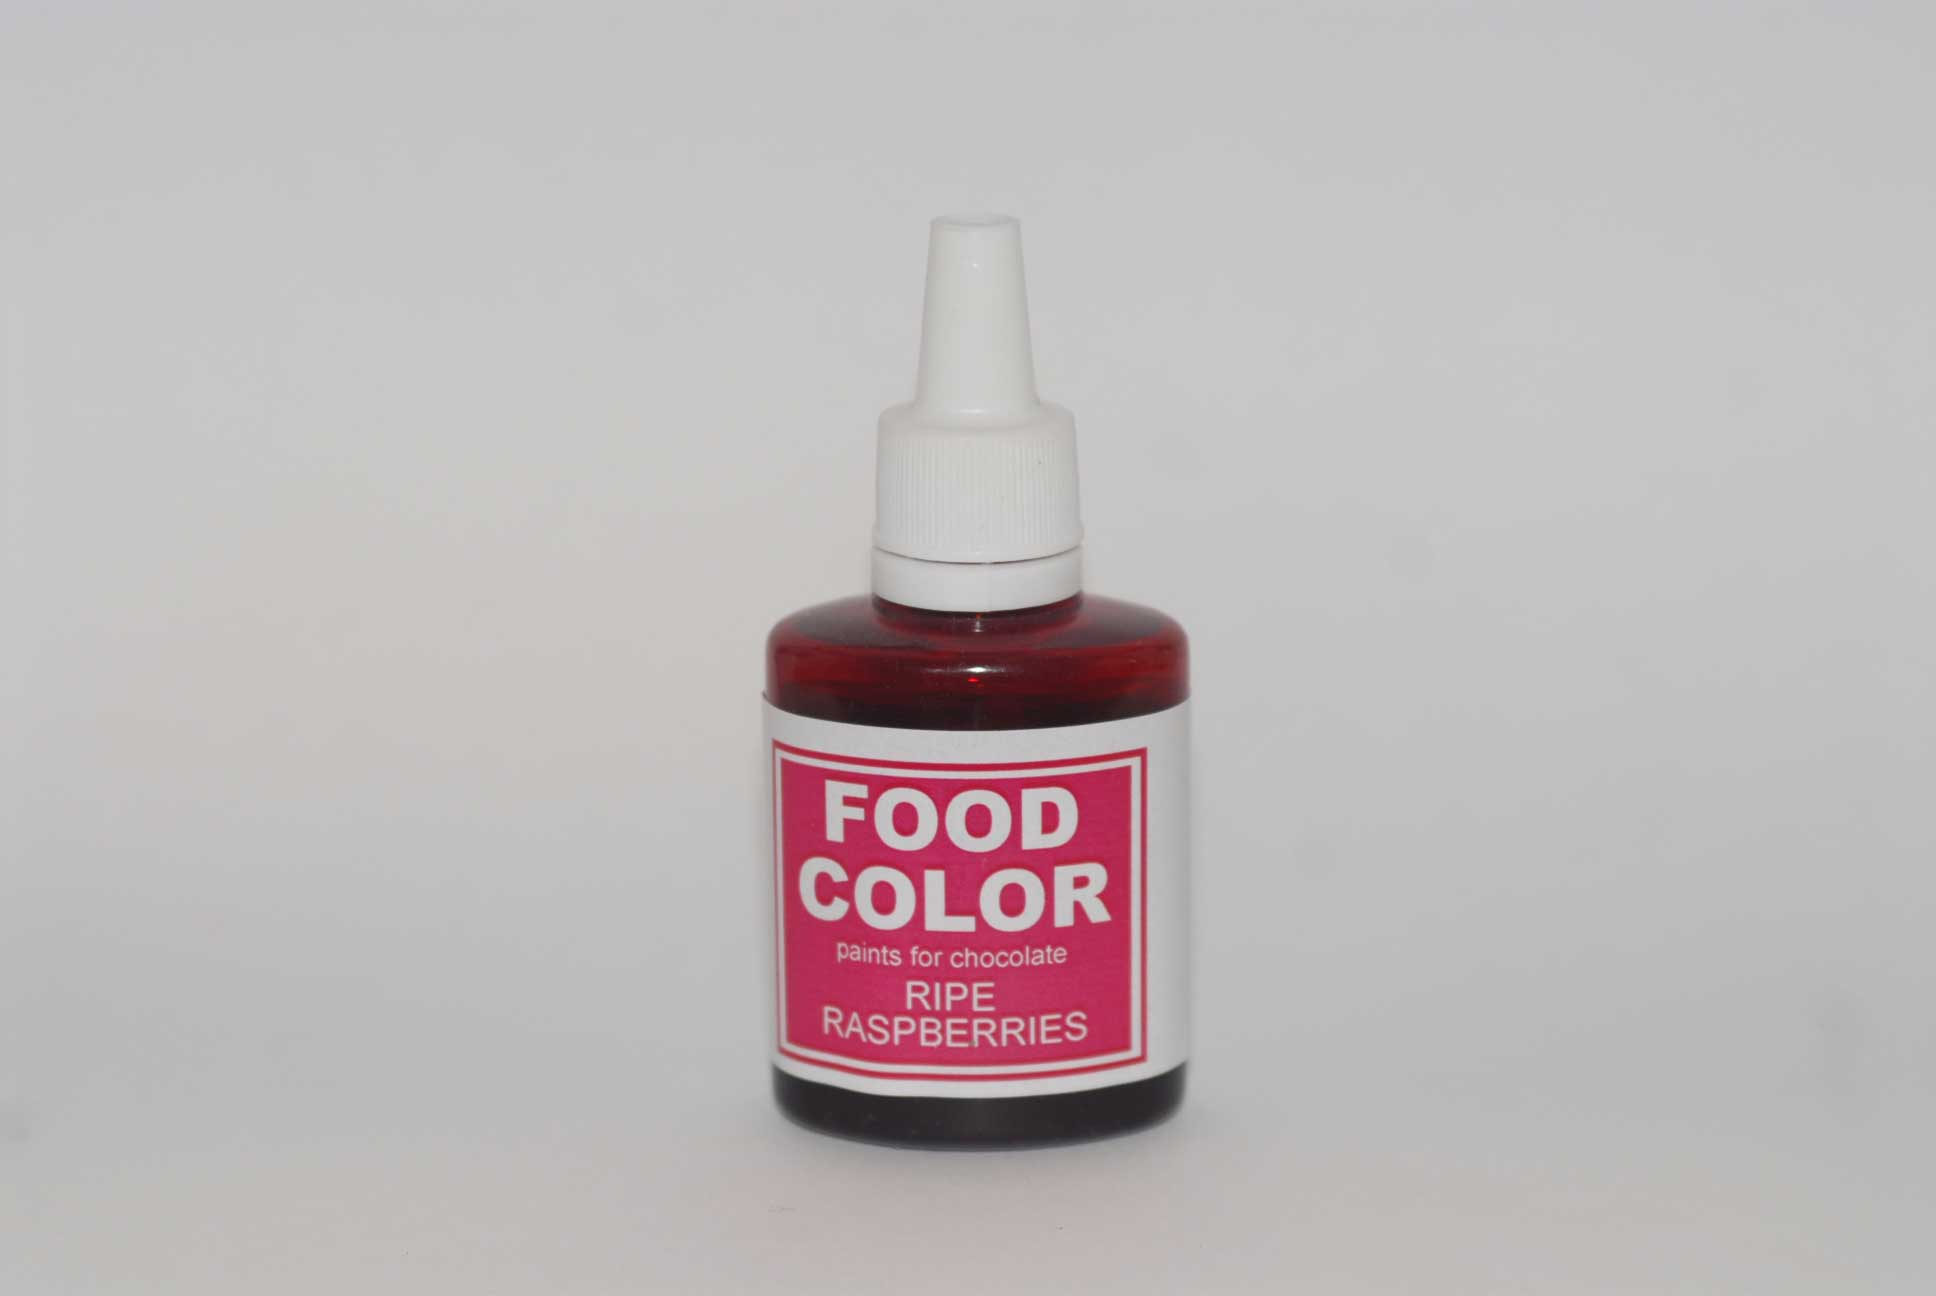 Краситель для шоколада FOOD COLOR Ripe Raspberries / Спелая , 25 гр